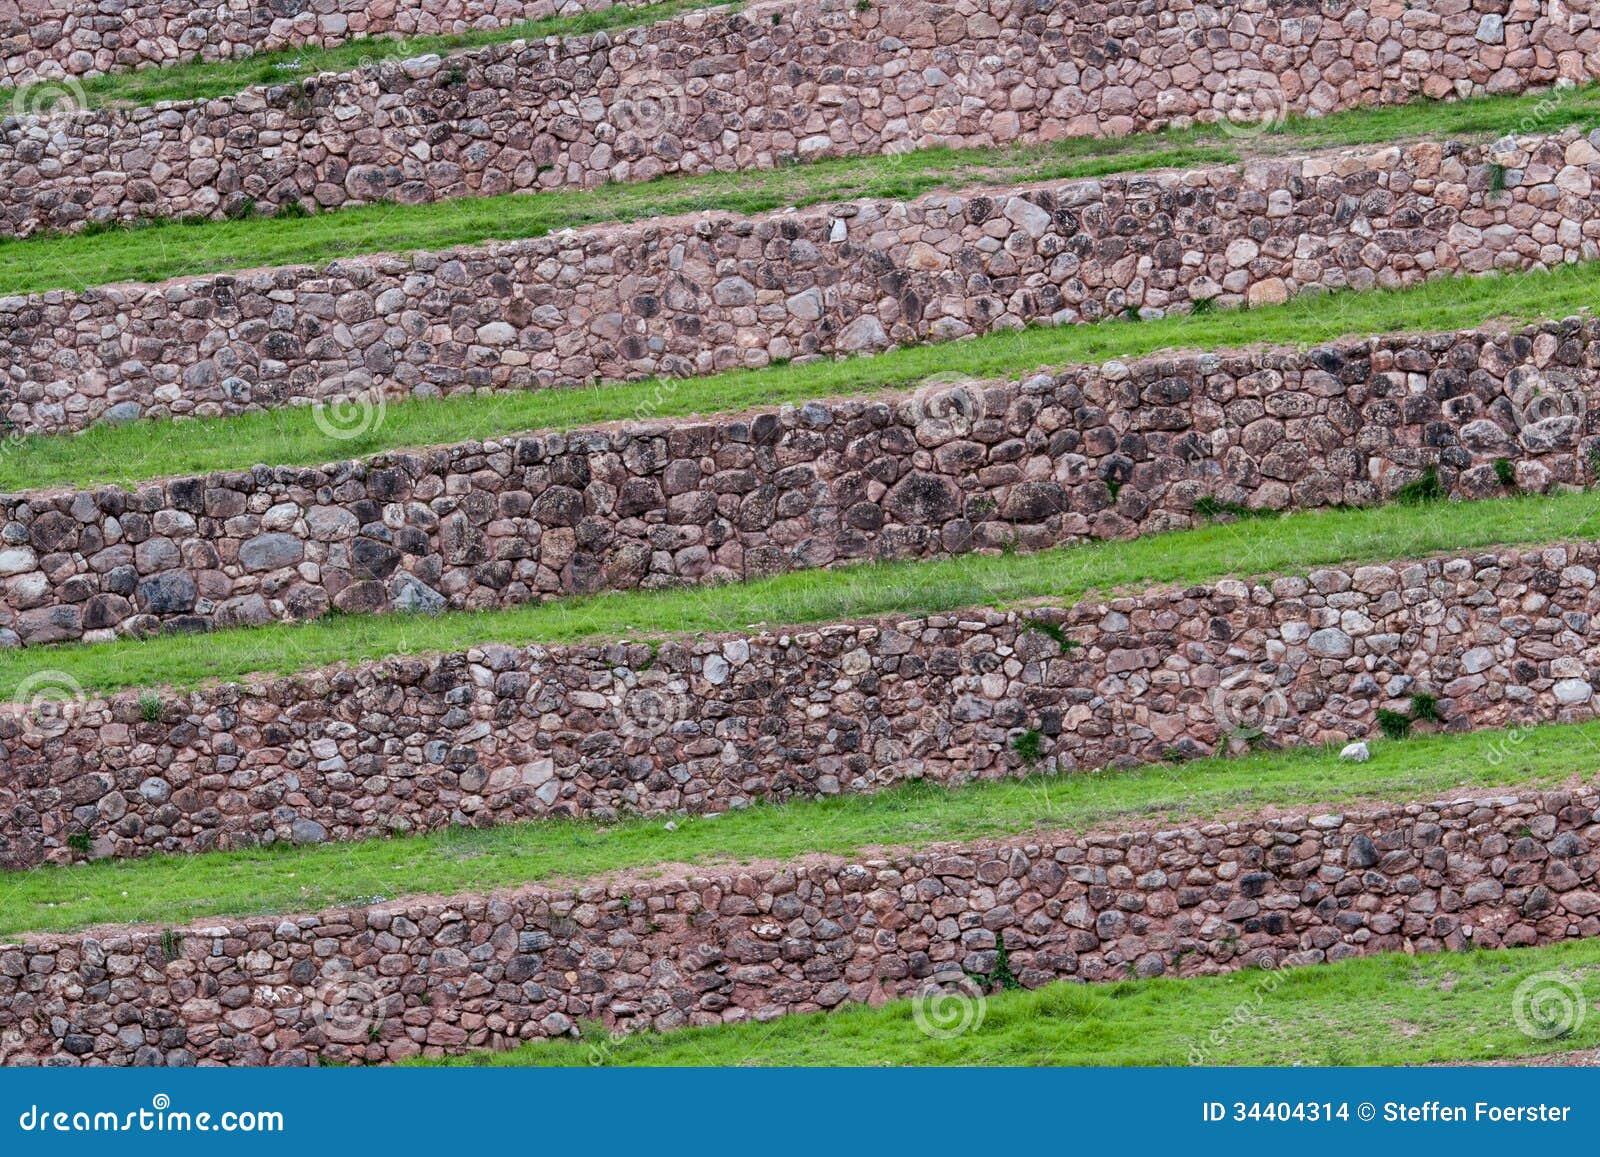 Terrassen in moray heilige vallei peru stock afbeeldingen afbeelding 34404314 - Afbeeldingen van terrassen verwachten ...